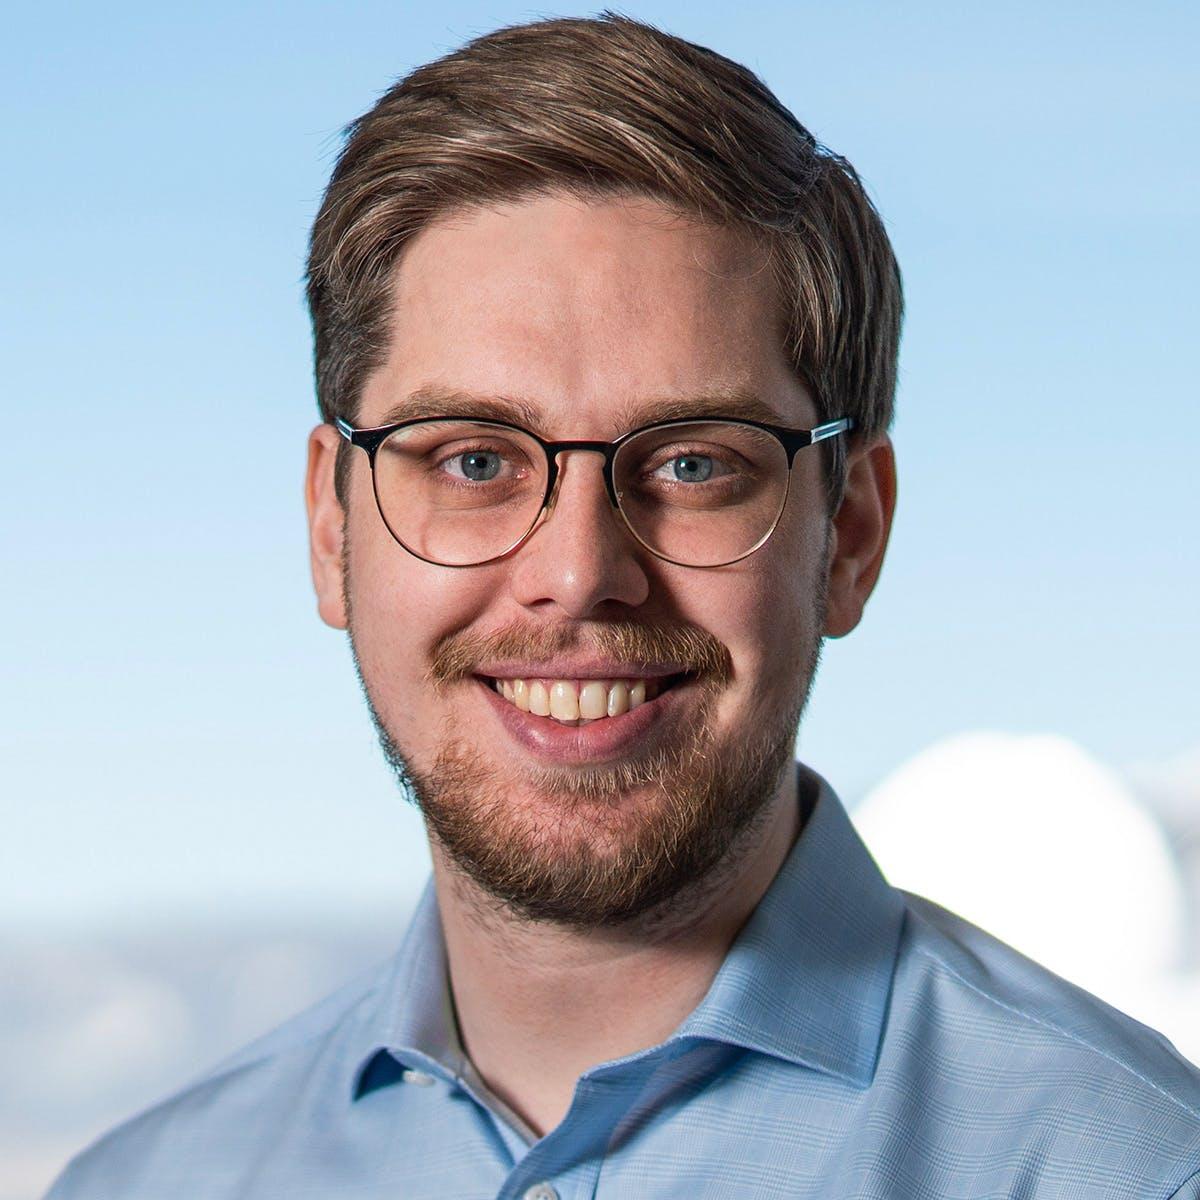 Kristján Ingi Mikaelsson